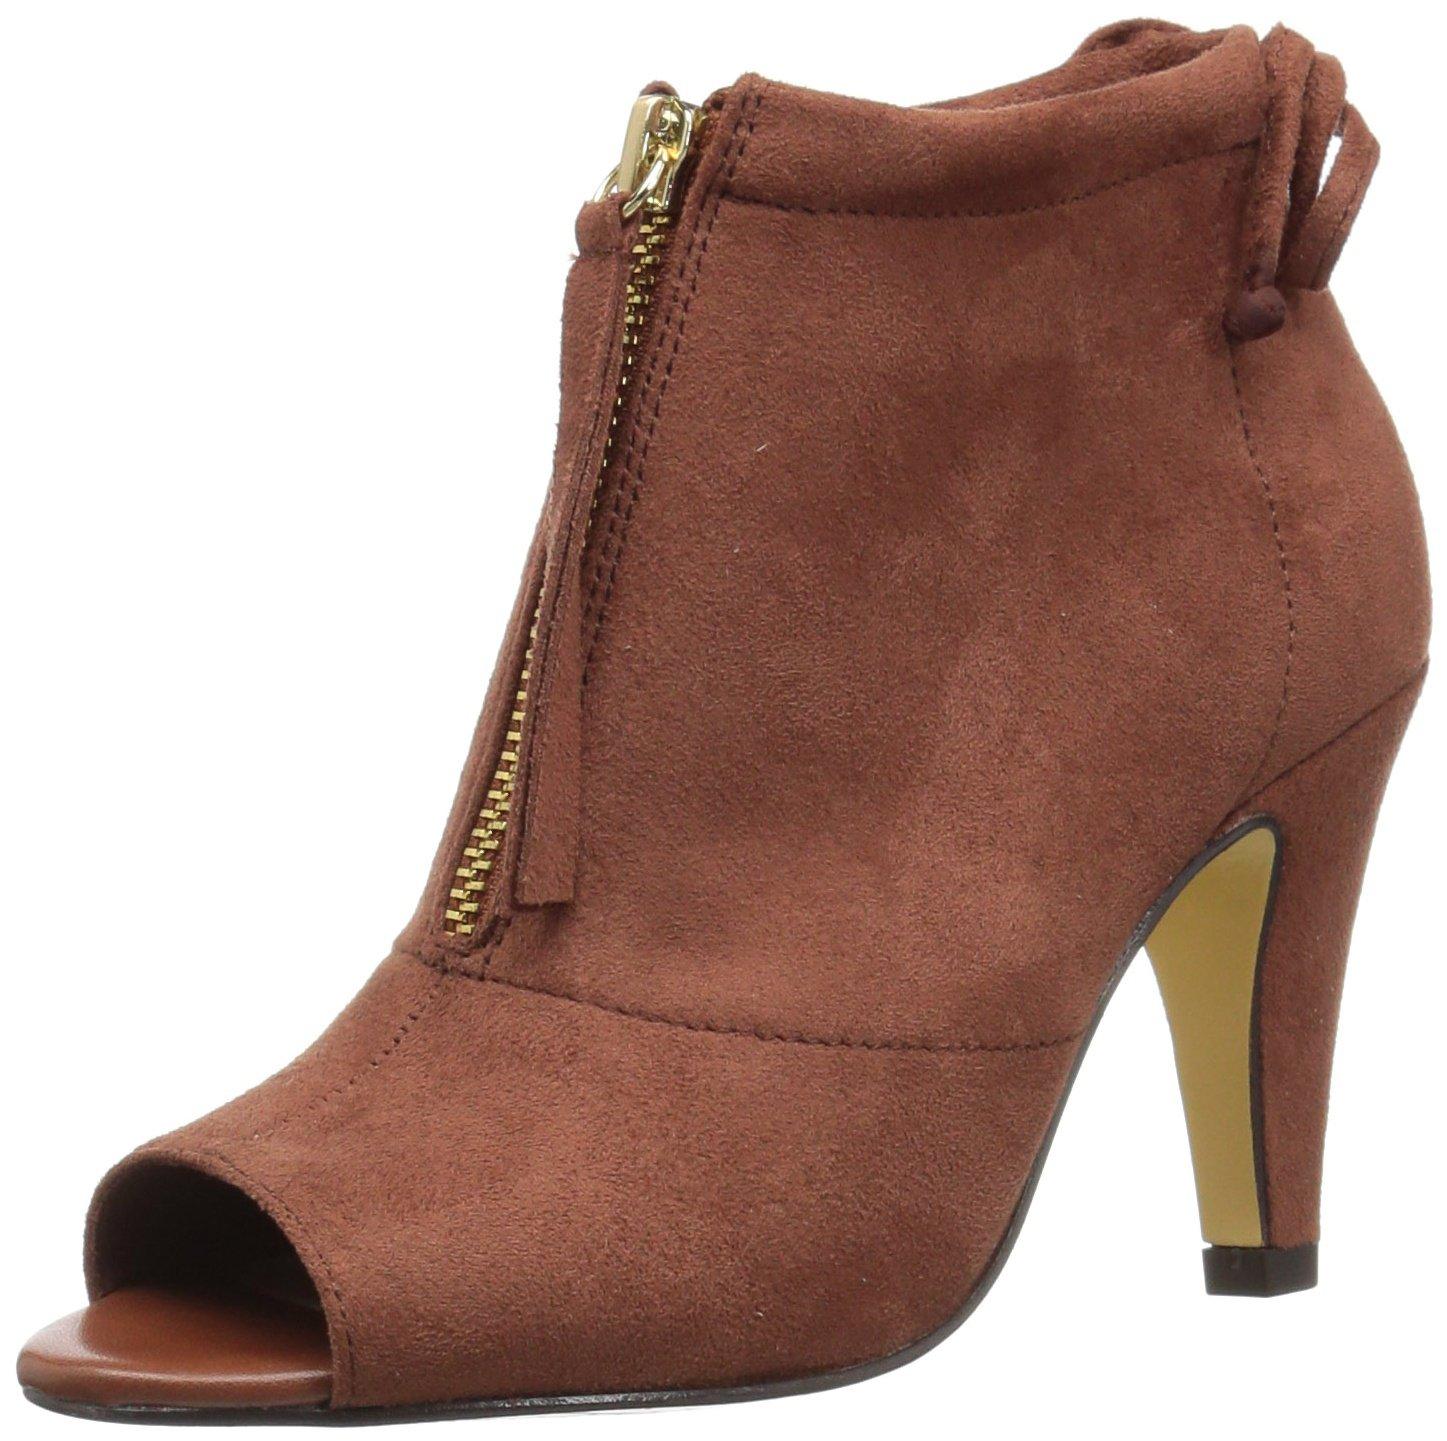 Bella Vita Women's Nicky Ii Ankle Bootie B0731SCK6P 7.5 N US|Camel Super Suede